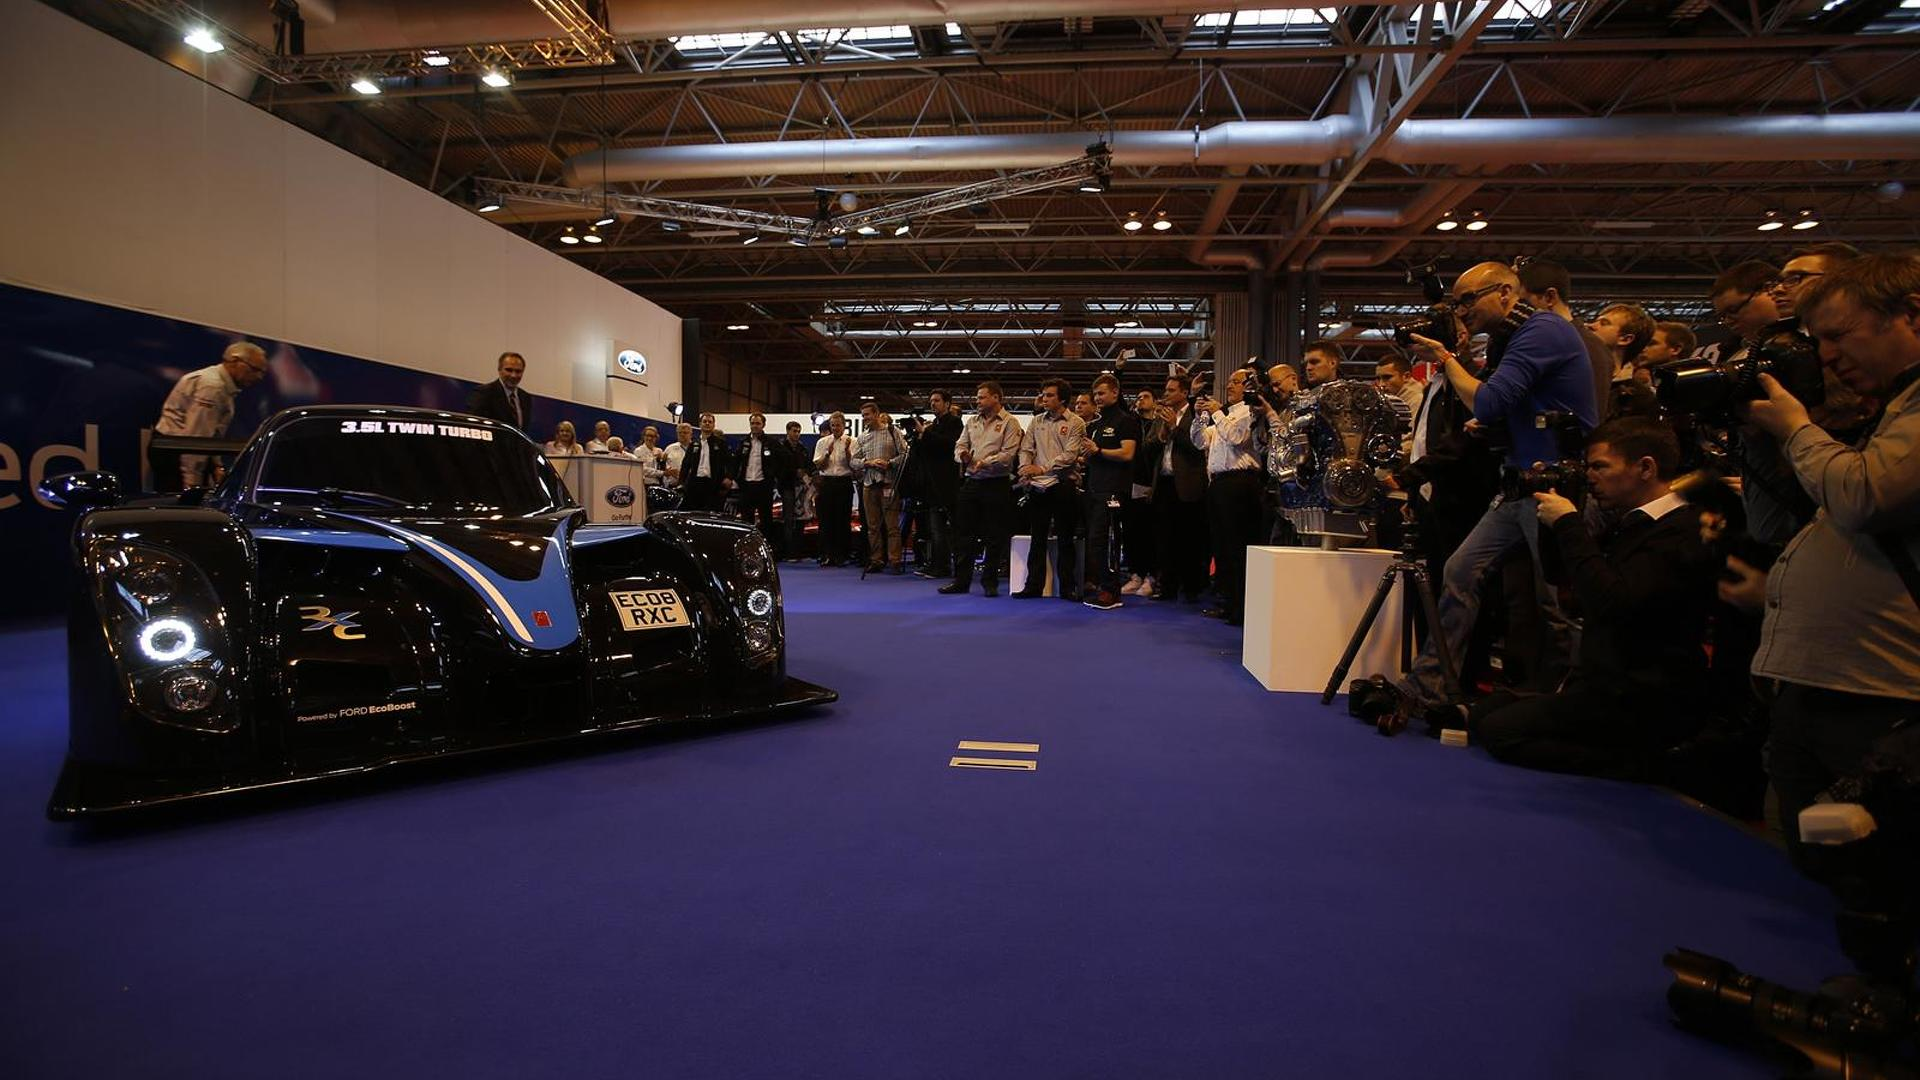 Radical RXC Turbo unveiled at Autosport International, packs a 454 bhp twin-turbo V6 EcoBoost engine